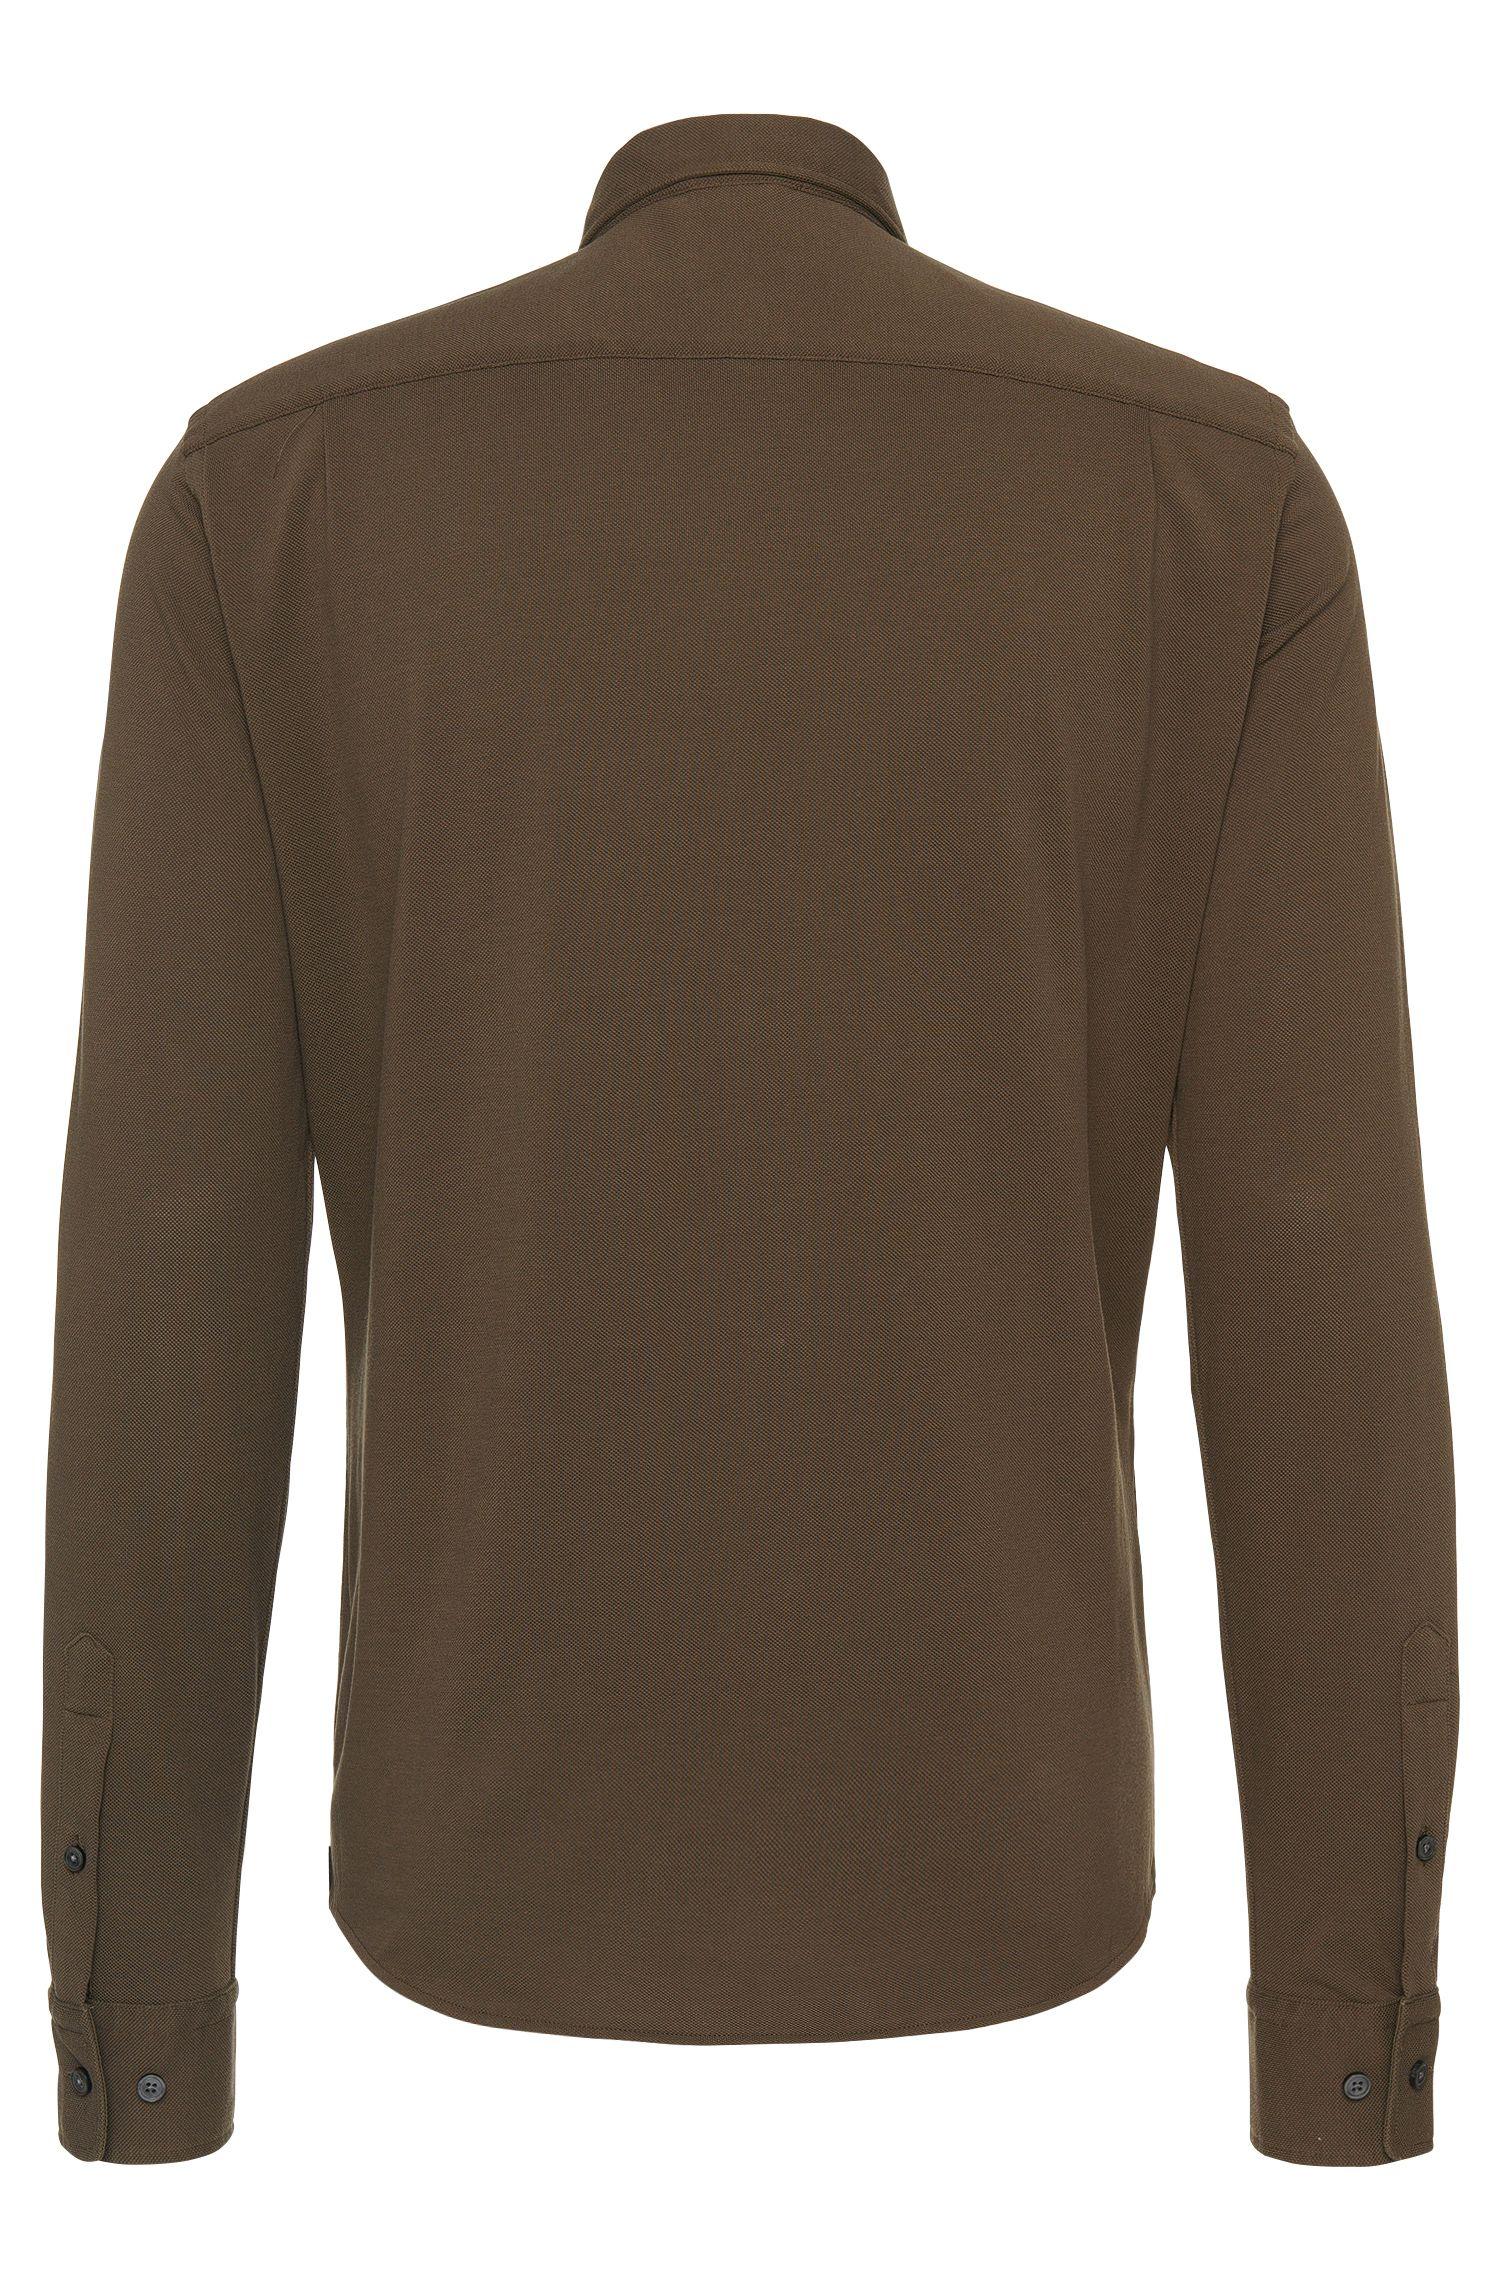 Slim-Fit Hemd aus Baumwolle im Poloshirt-Stil: 'Rune_30'